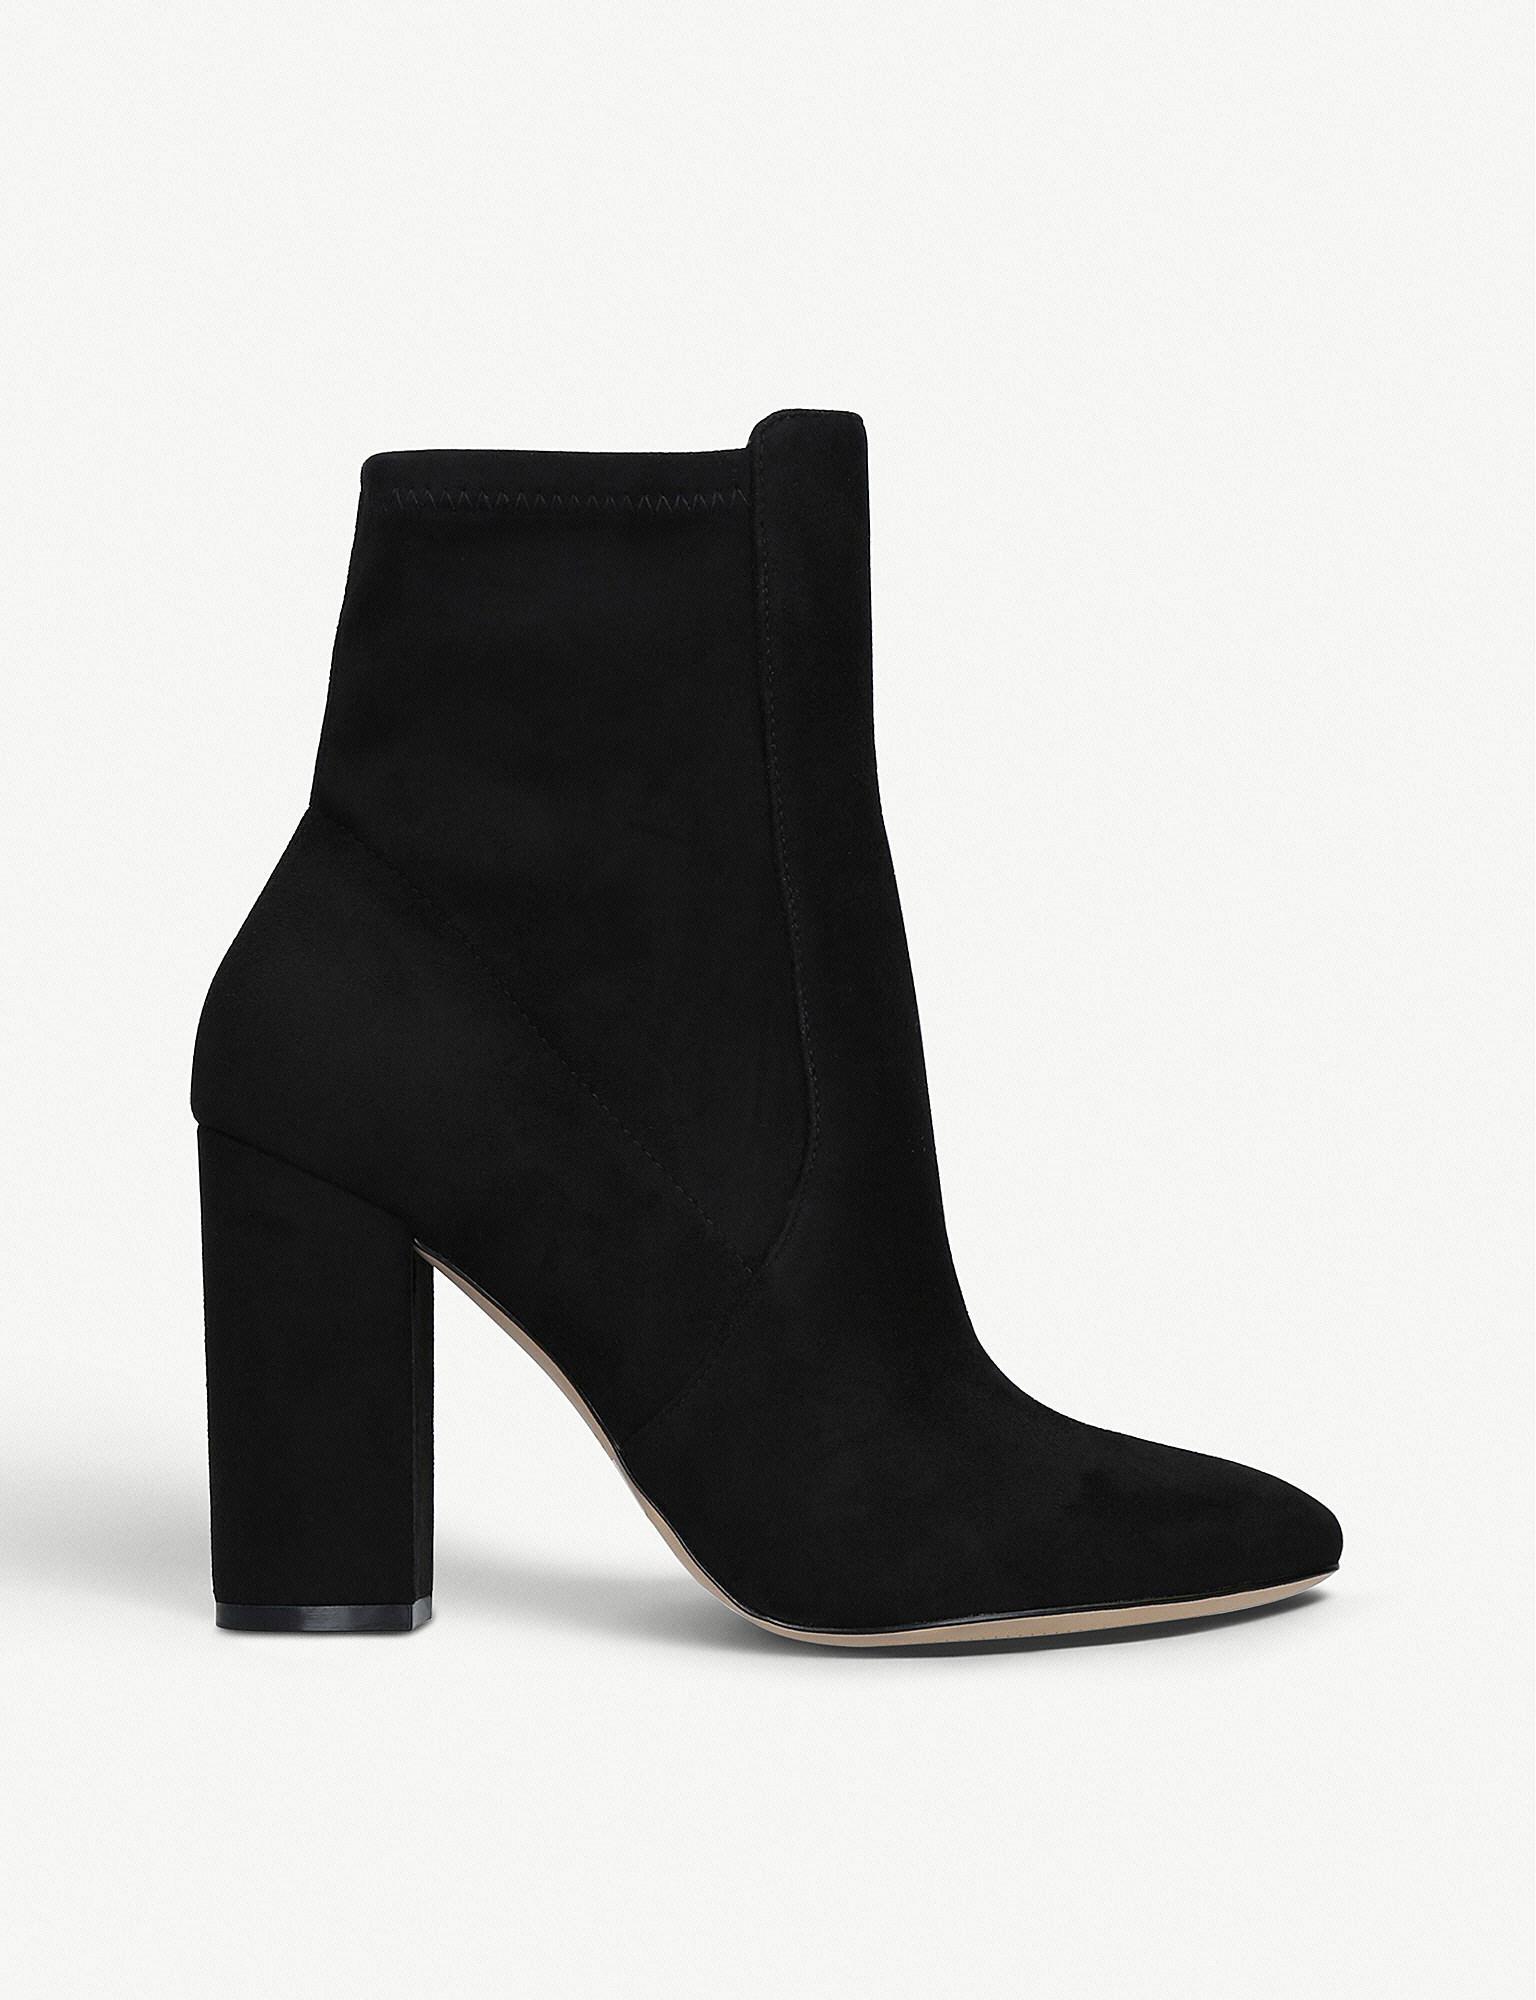 ALDO Suede 'aurella' Ankle Boots in